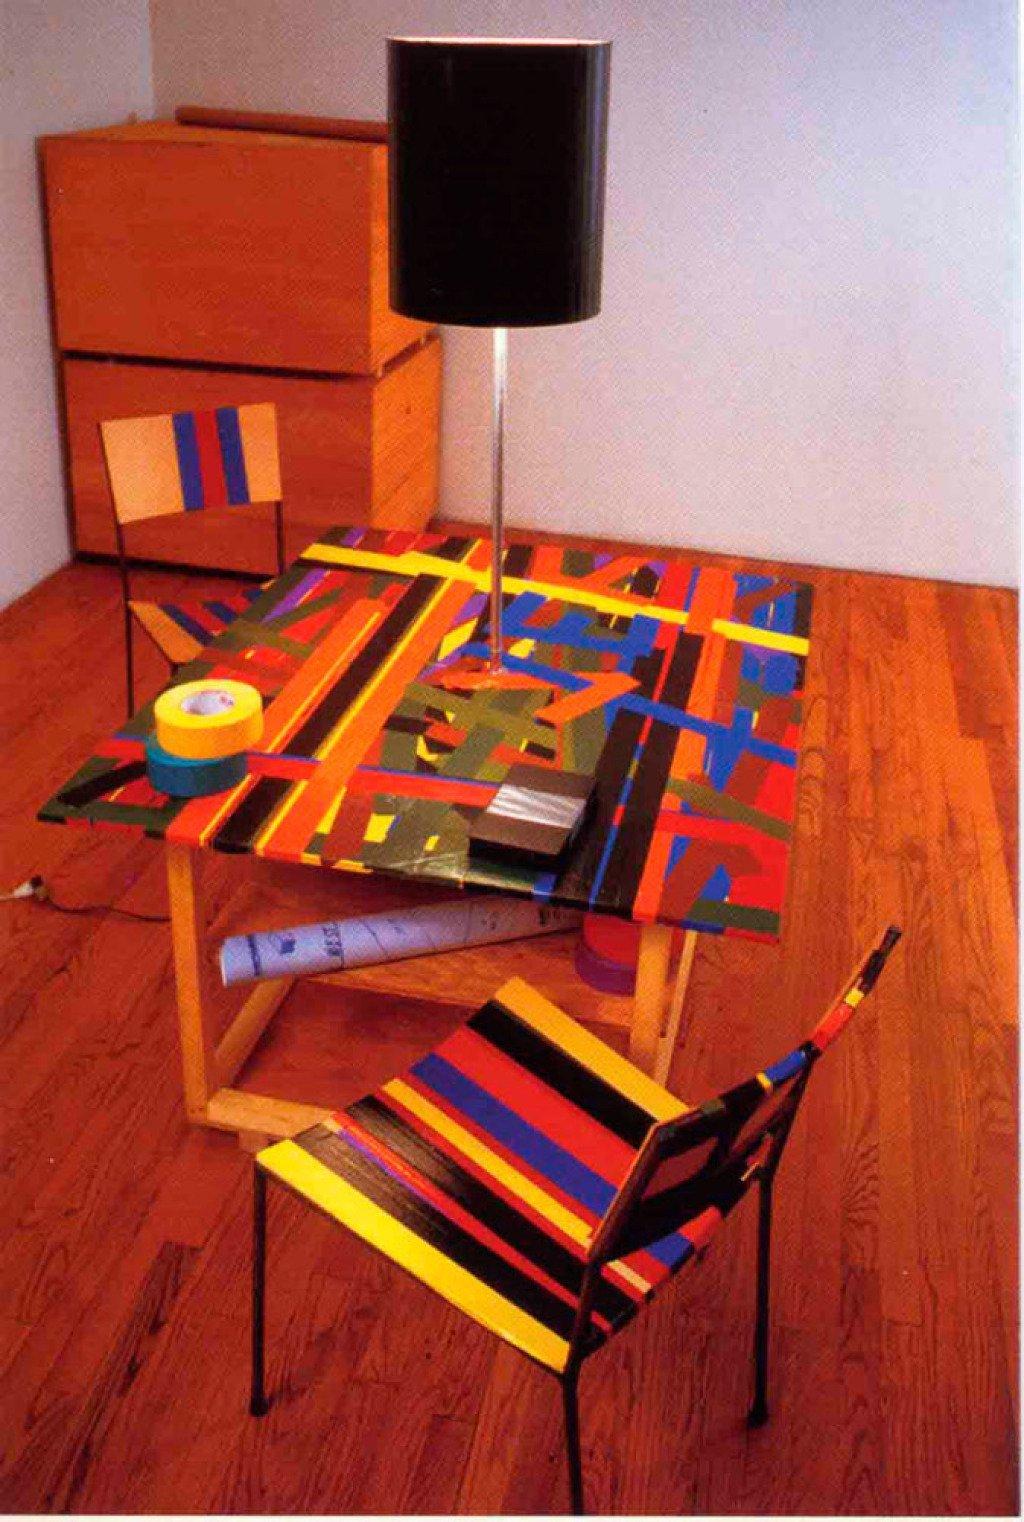 Franz West - Creativity: Furniture Reversal for Sale | Artspace